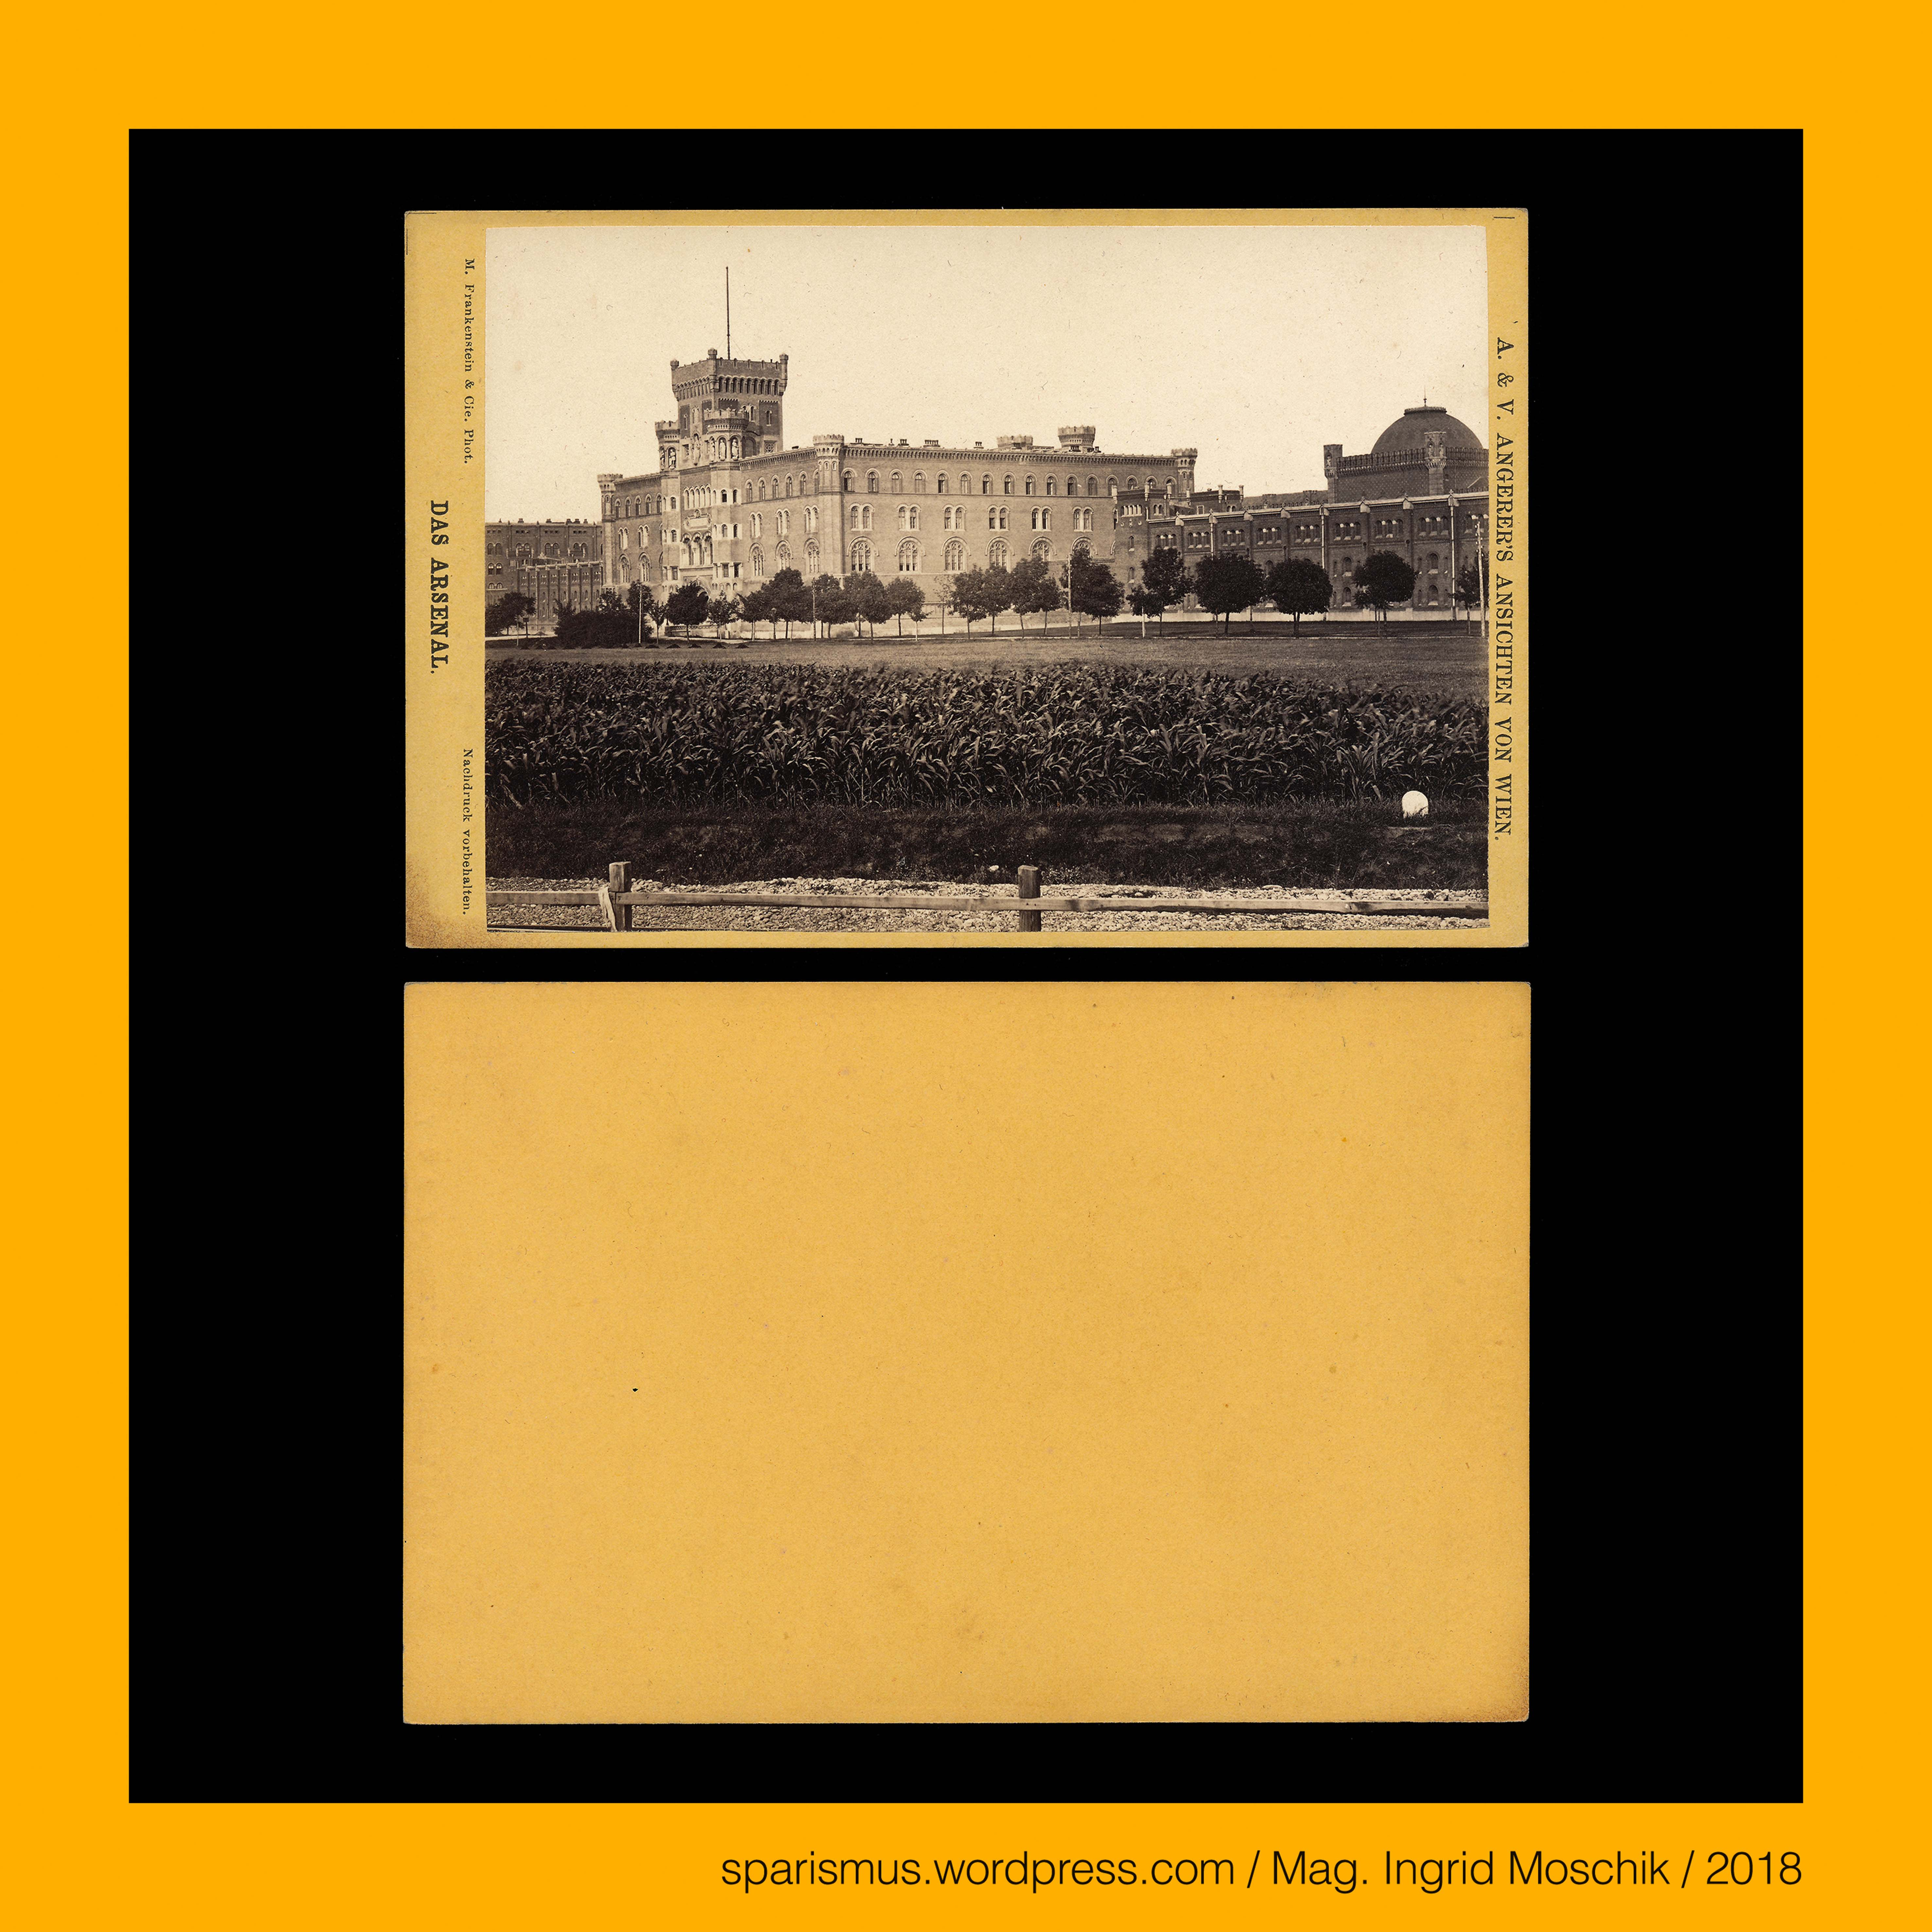 1936 Foto-ak Ruf Zuerst Ak Wien Xix Panorama Kahlenberg Restaurant